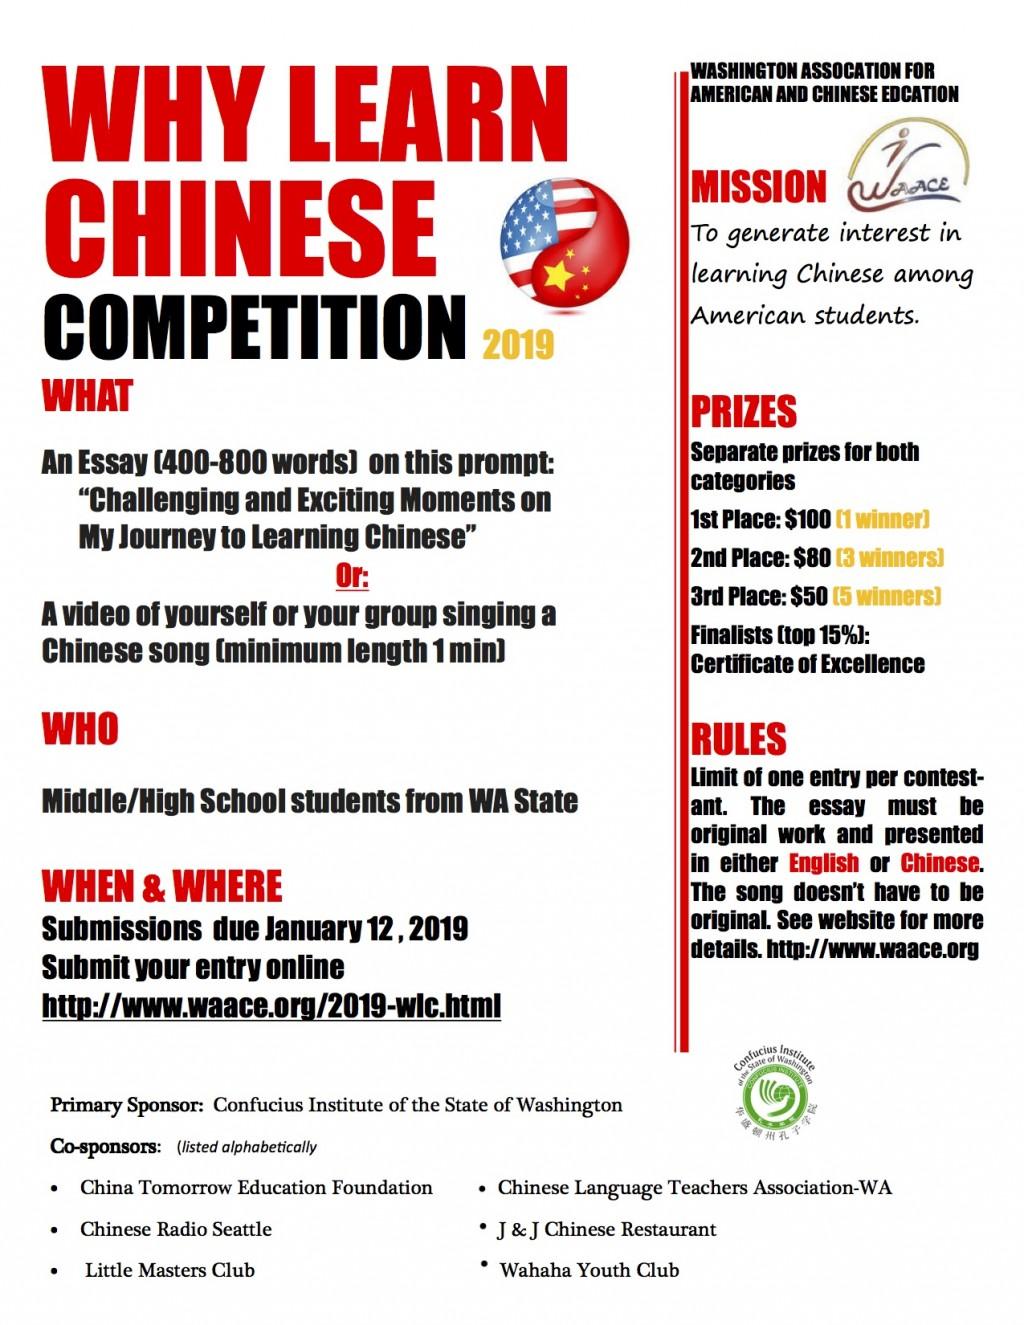 020 Essay Example Wlc2019 Flyer Img Amazing Chinese Art Topics Vce Formats Sheet Large